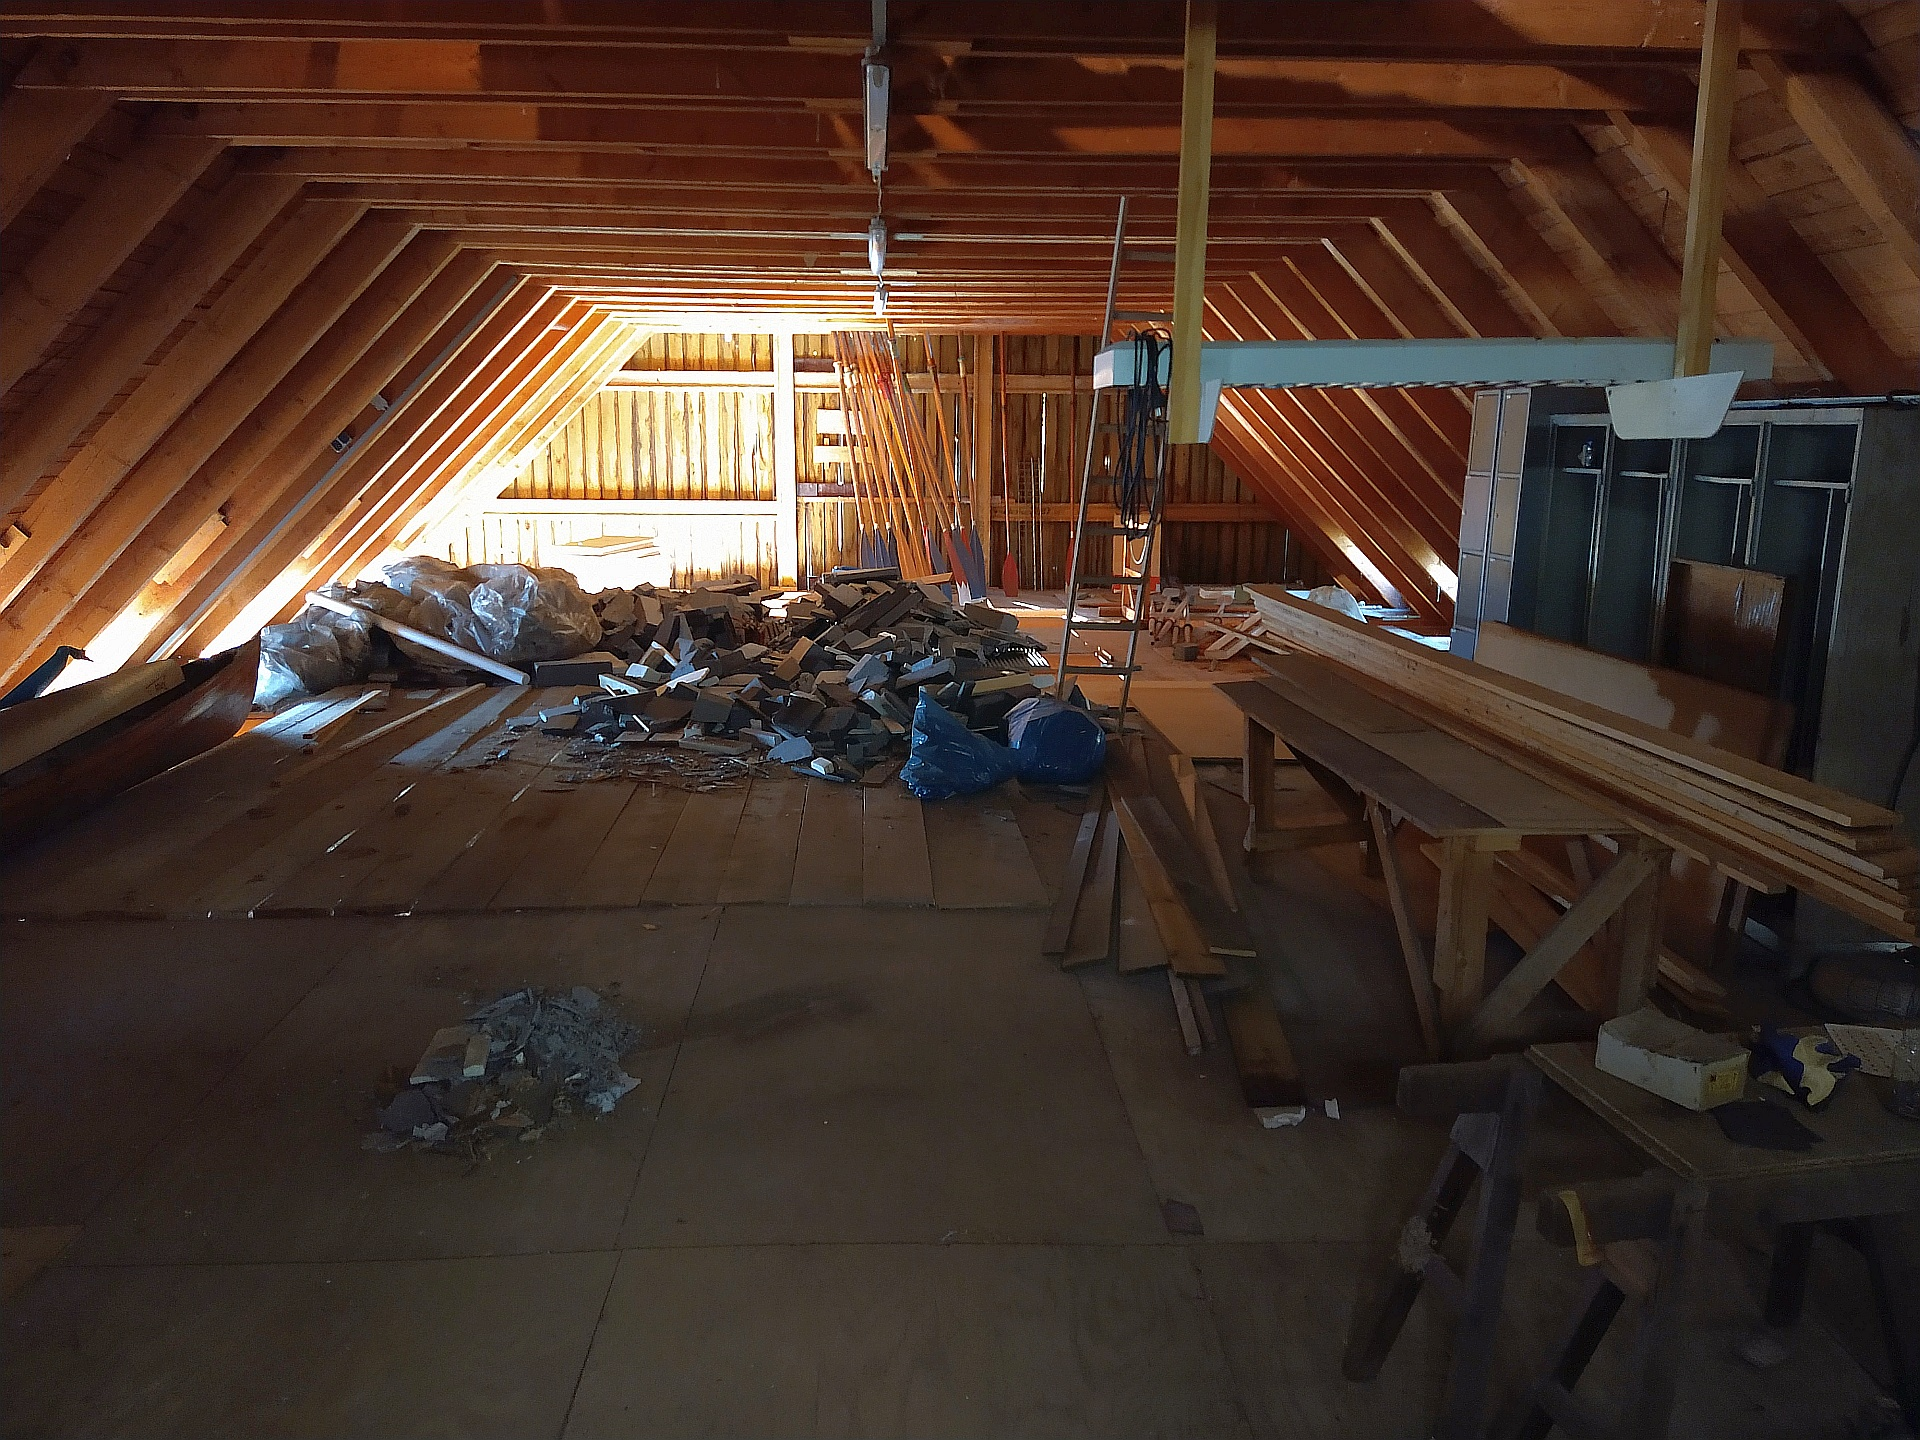 halb aufgeräumter Dachboden